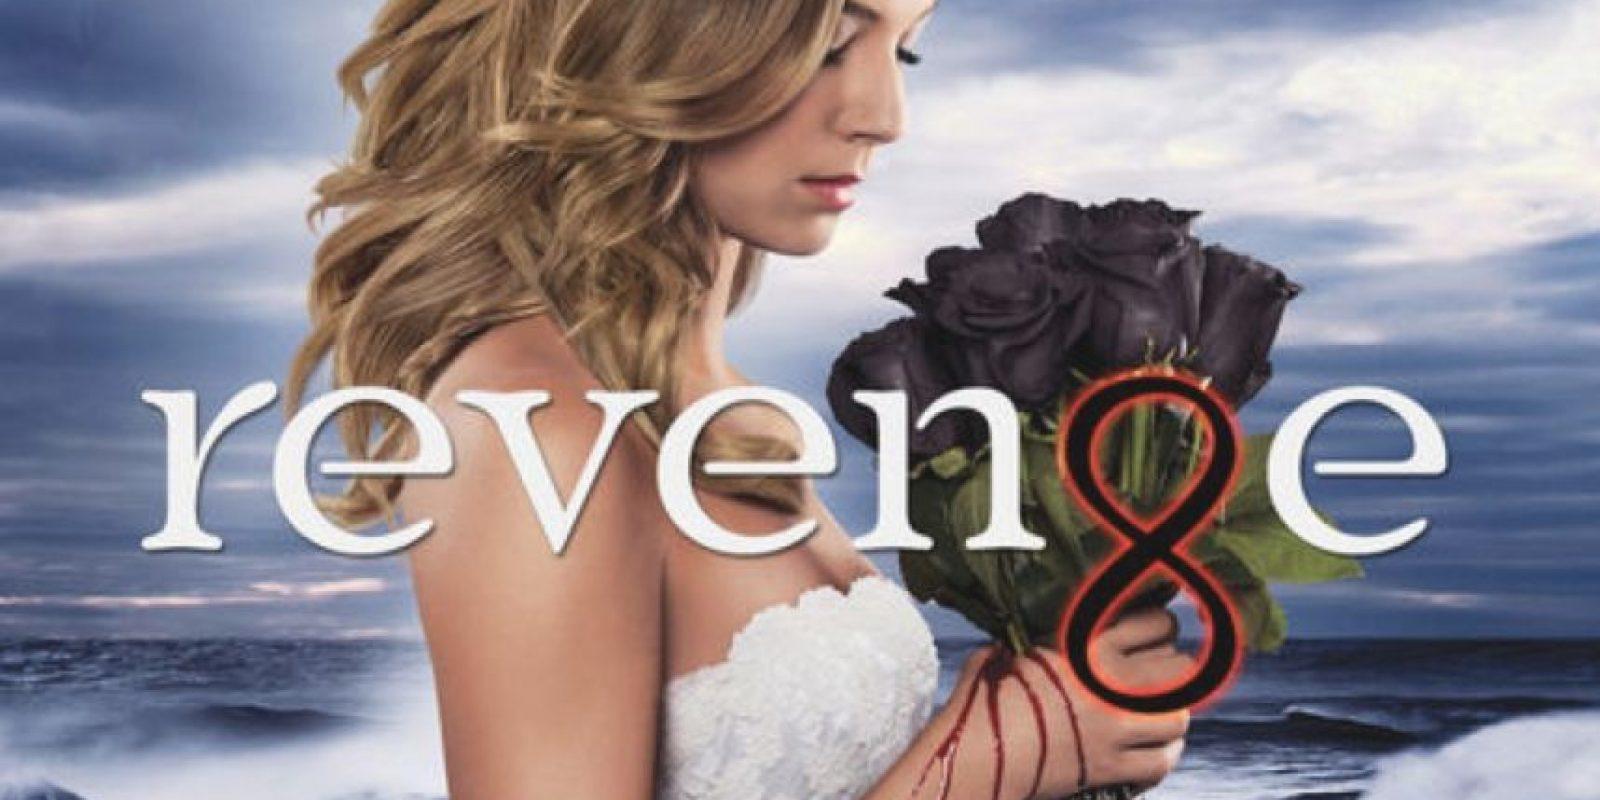 """Revenge – Temporada 4"". Disponible a partir del 1 de septiembre. Foto:ABC"